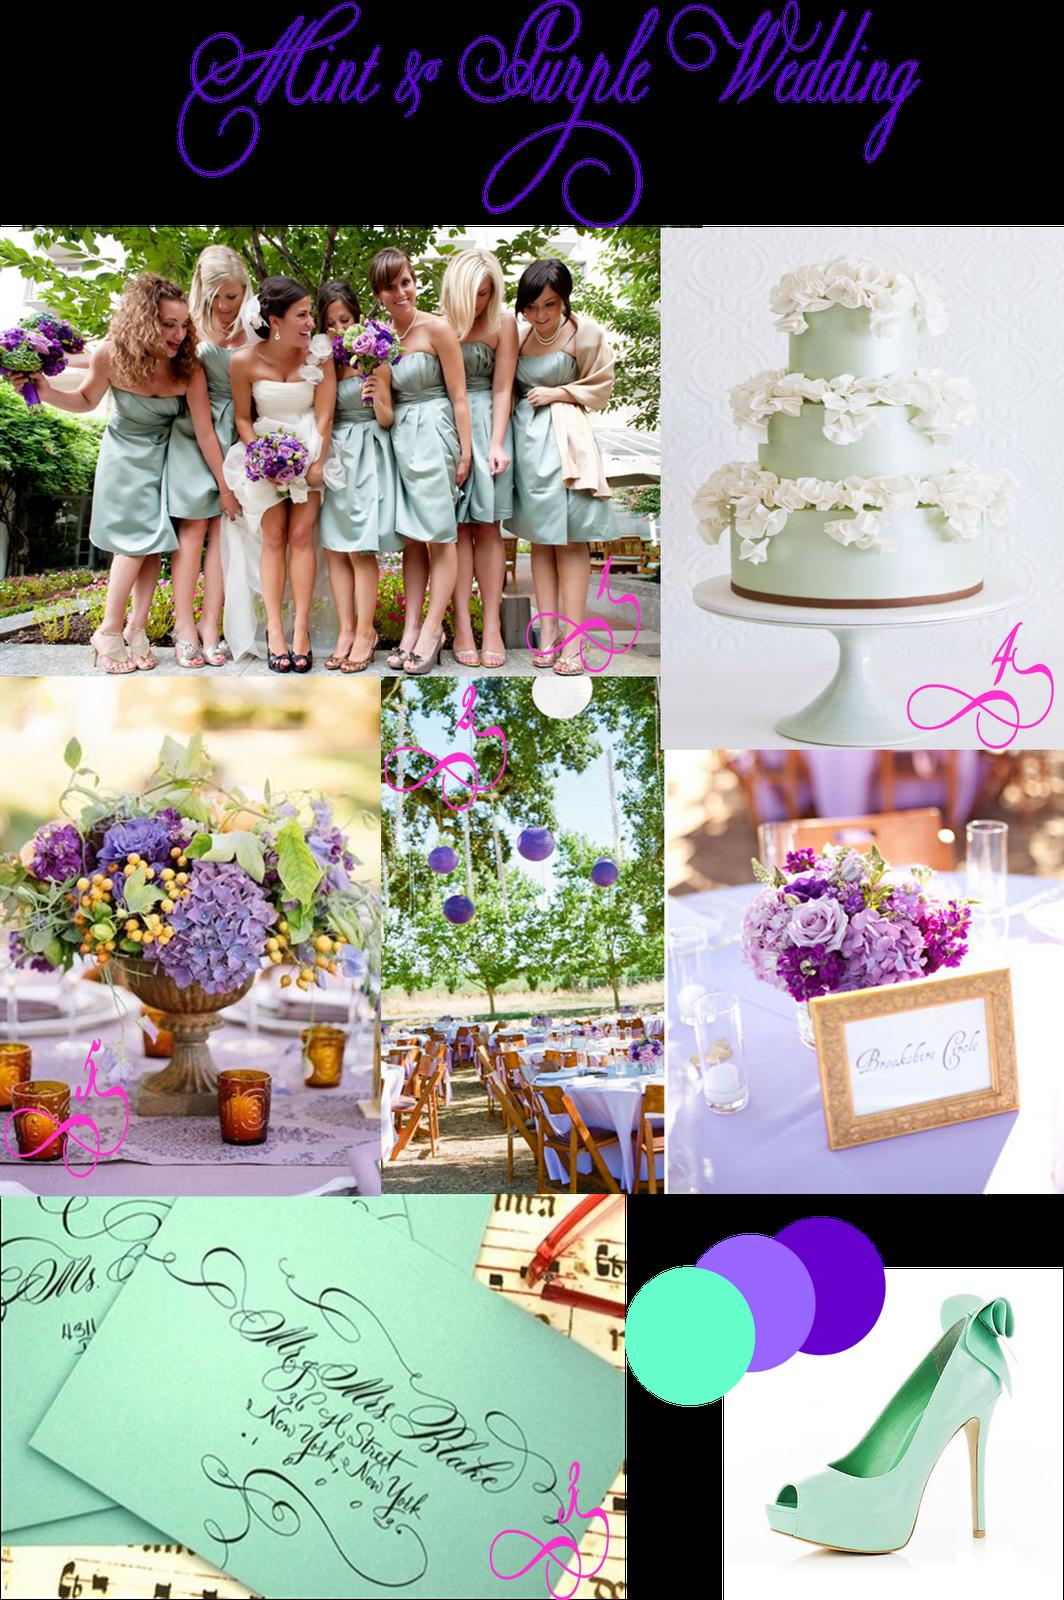 Pin By Vilma Malinauskaite On Wedding Pinterest Wedding Colors